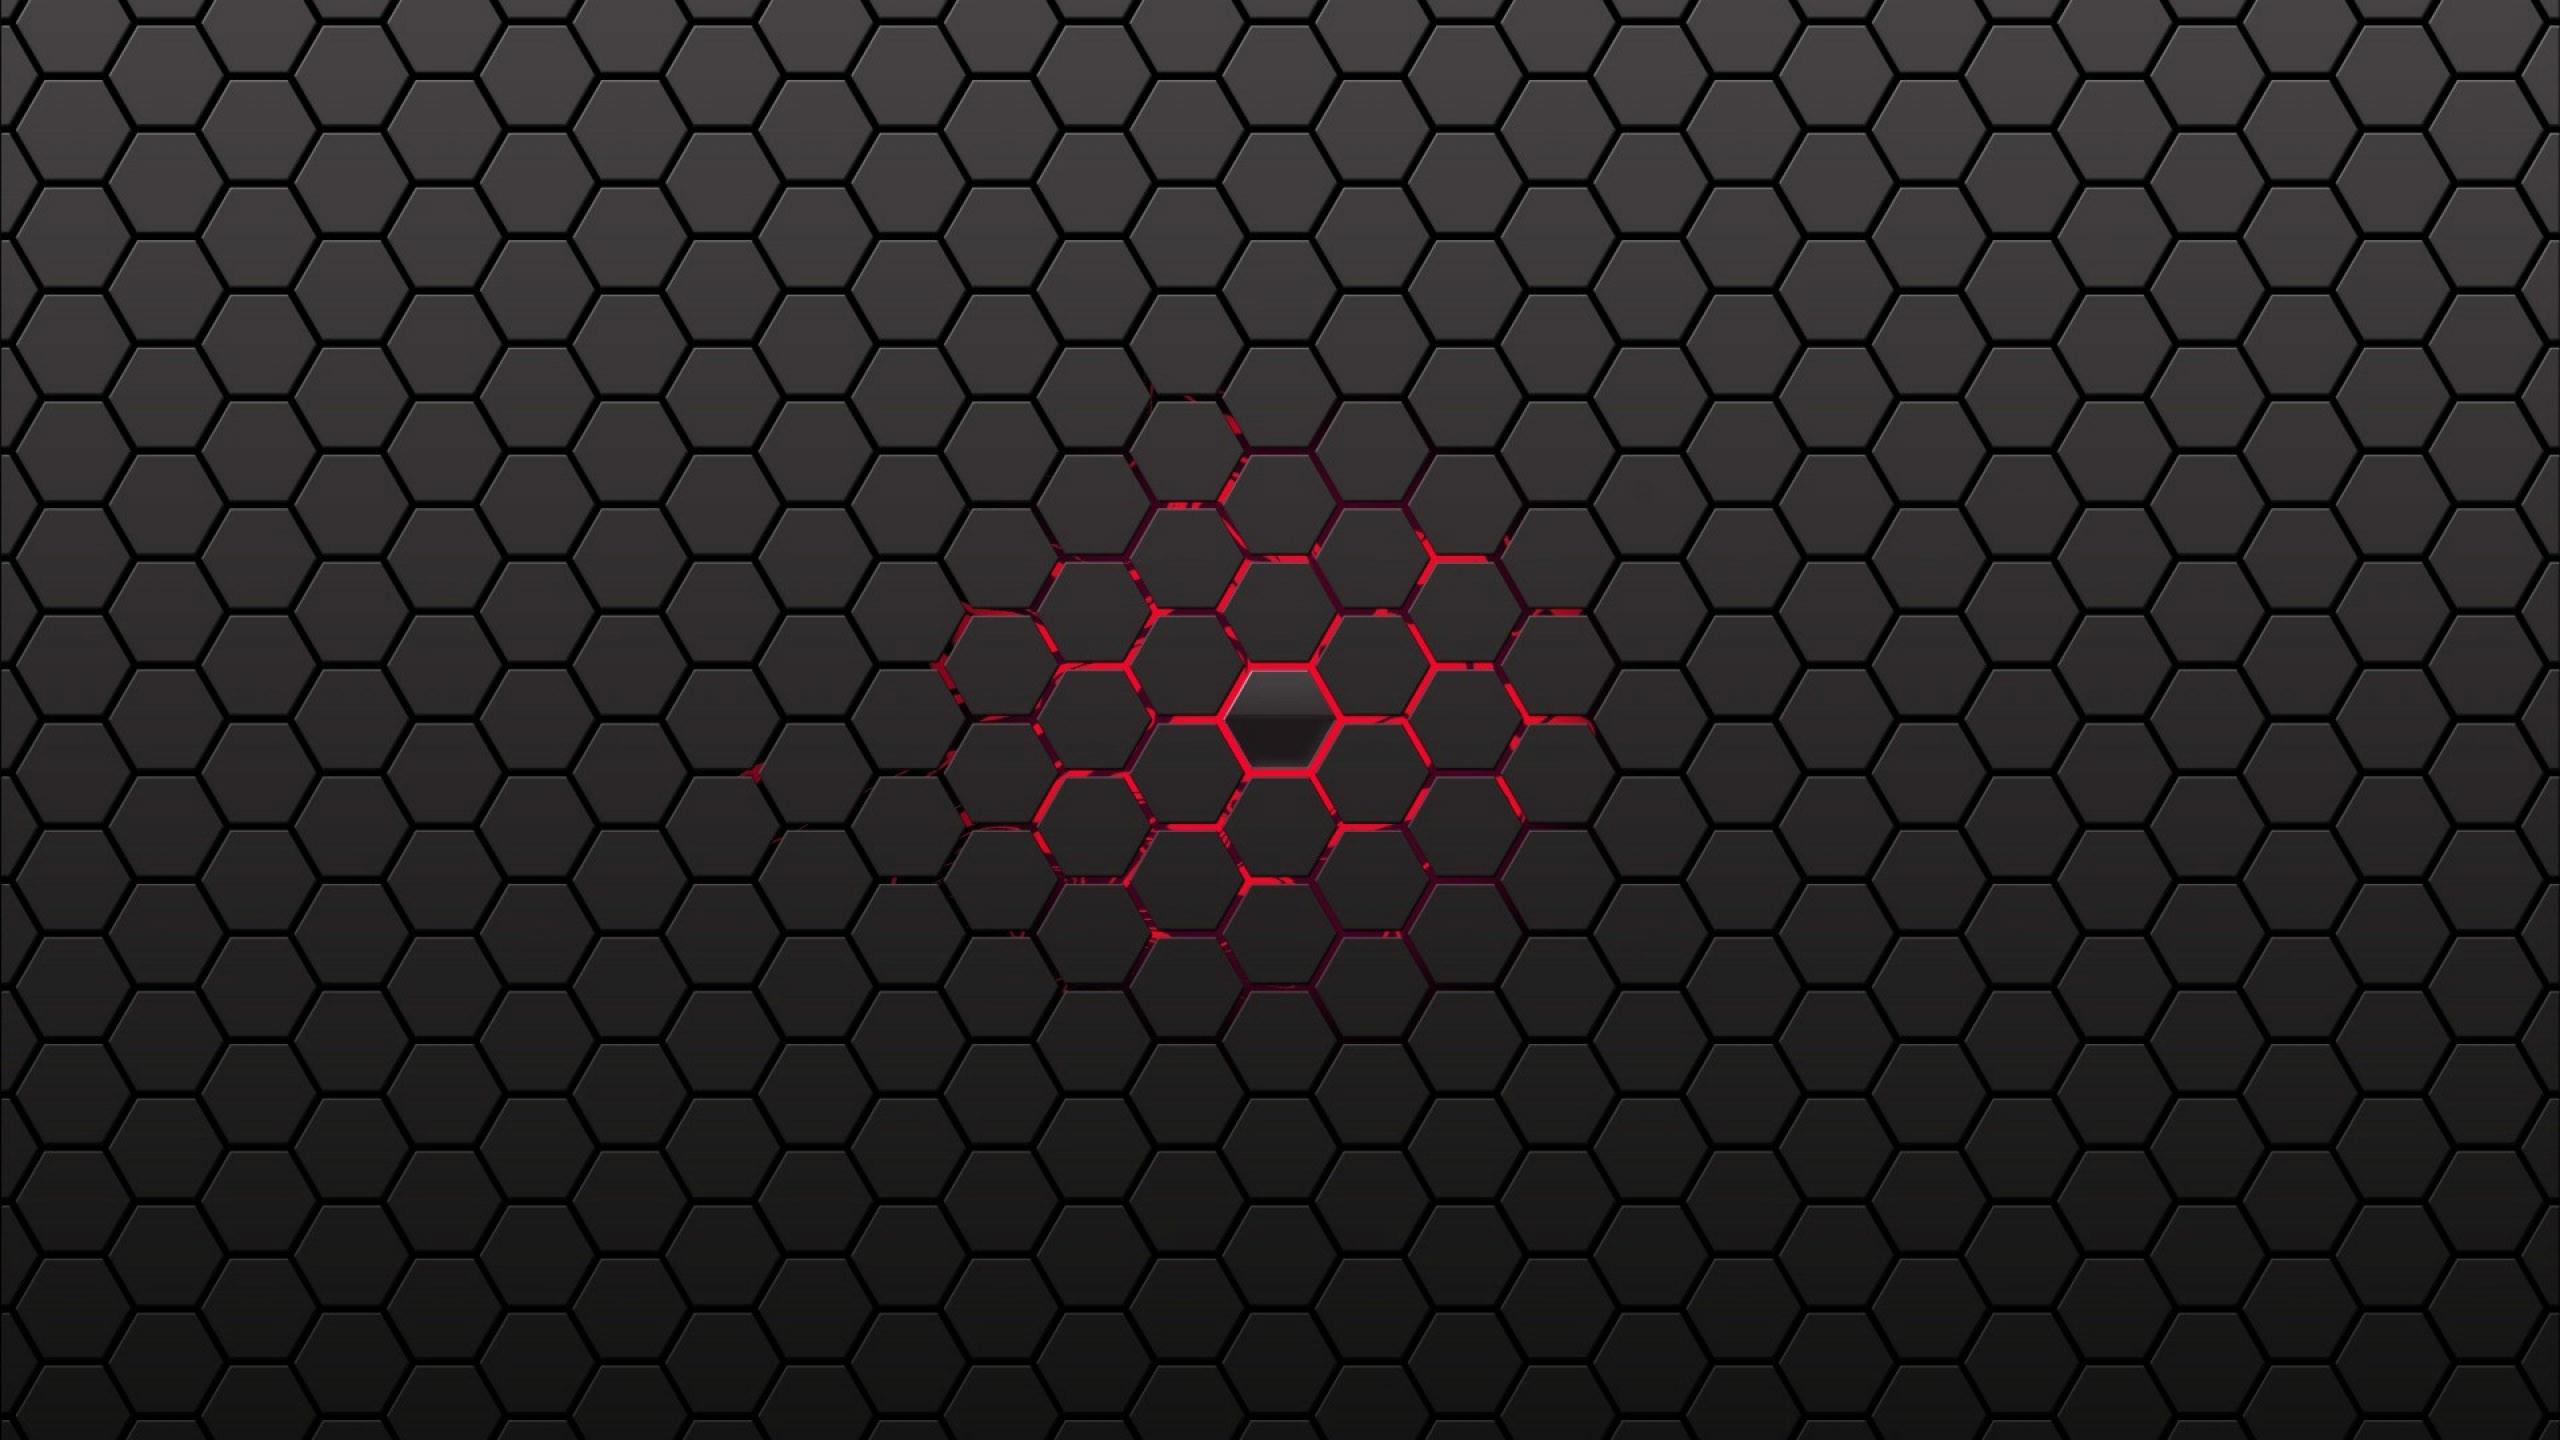 Dark Abstract Wallpapers HD 1920×1080 Black Abstract Wallpaper (65  Wallpapers)   Adorable